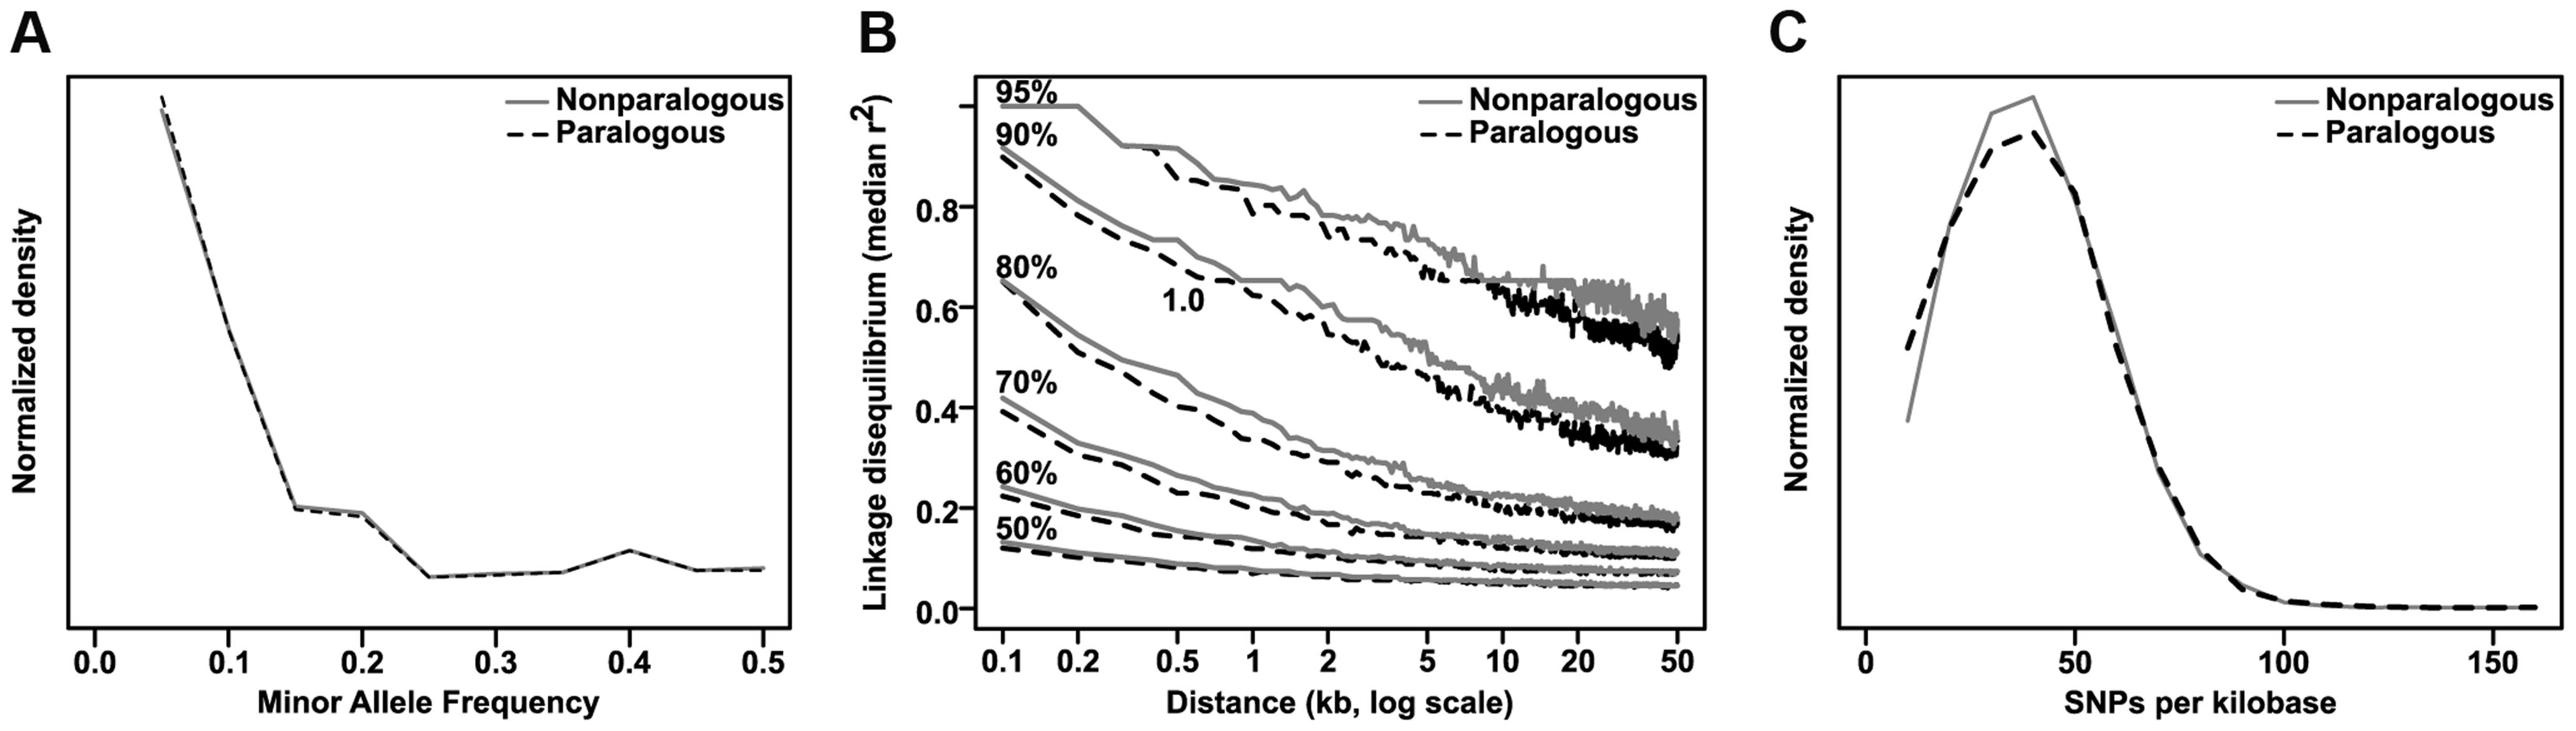 Comparison of paralogous to nonparalogous genes.